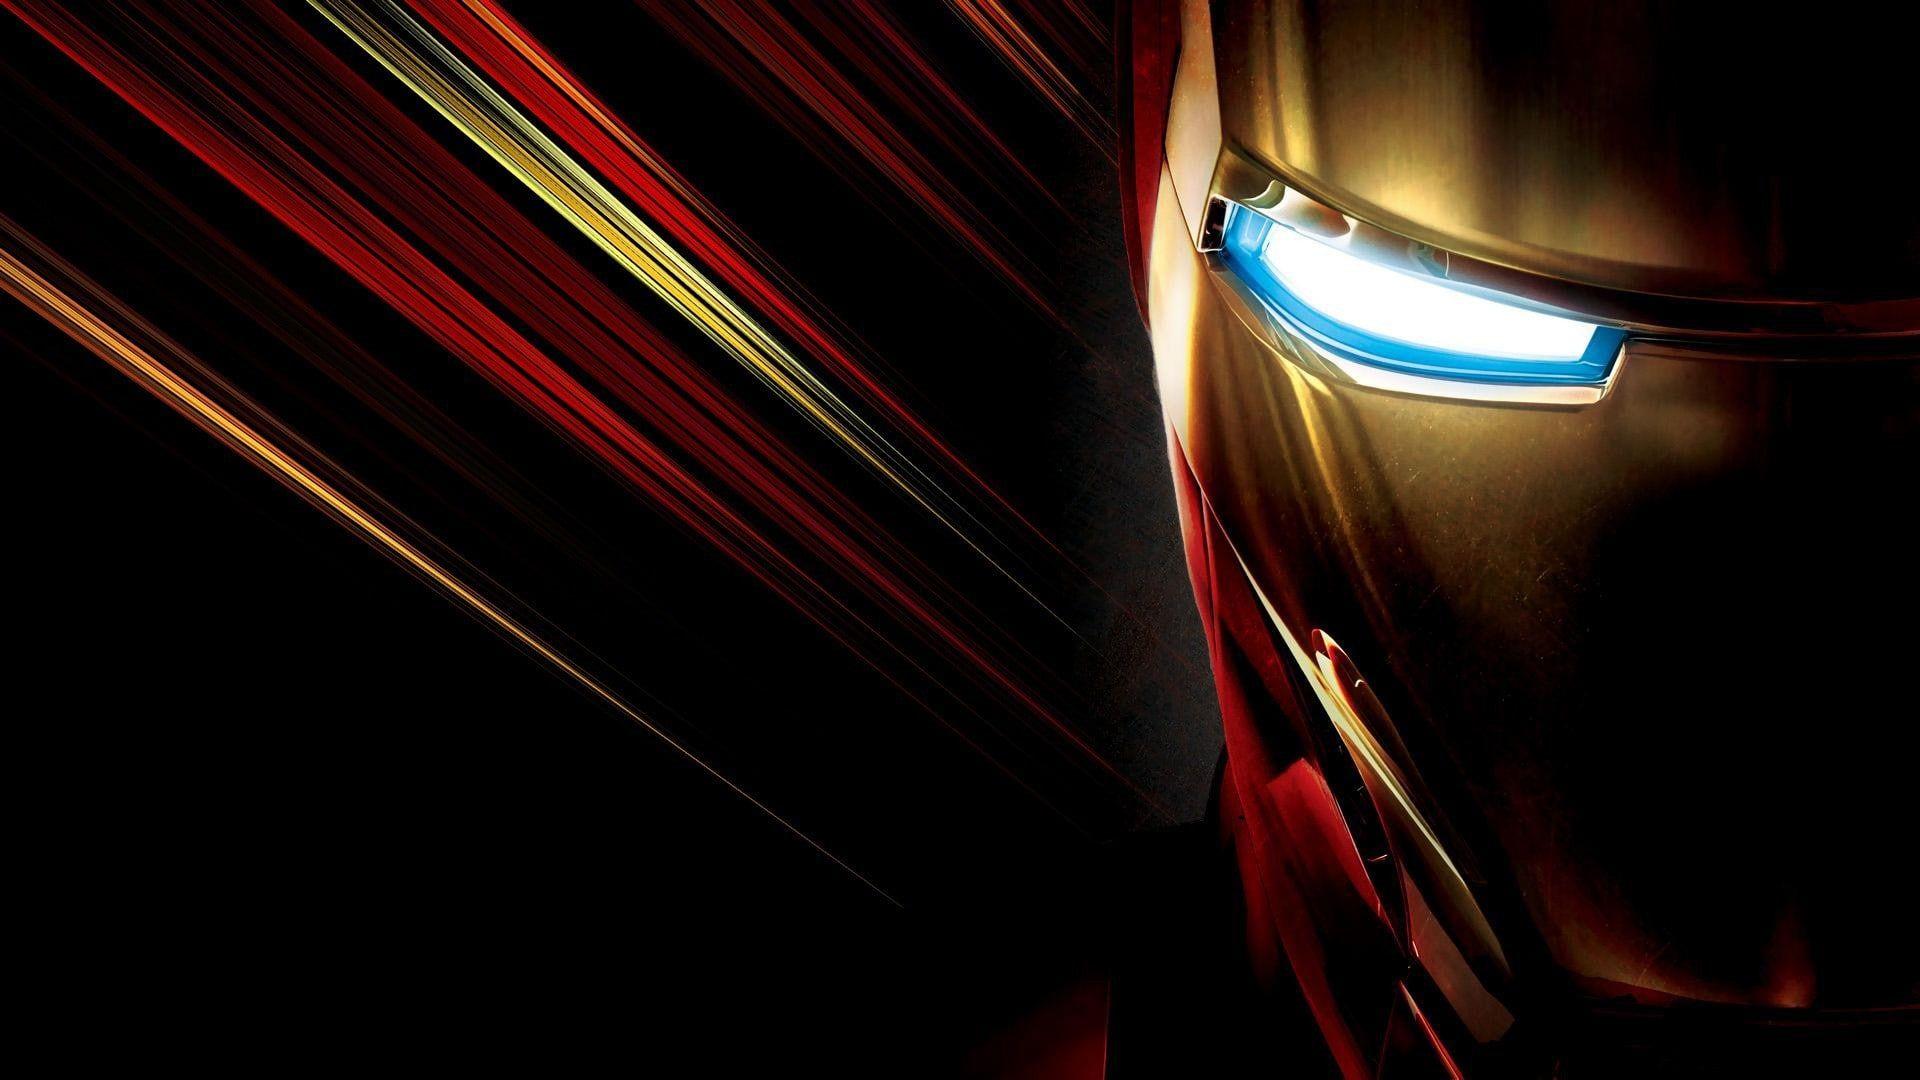 Iron Man Clip Art Iron Man 1080p Wallpaper Hdwallpaper Desktop In 2020 Iron Man Wallpaper Iron Man Hd Wallpaper Iron Man